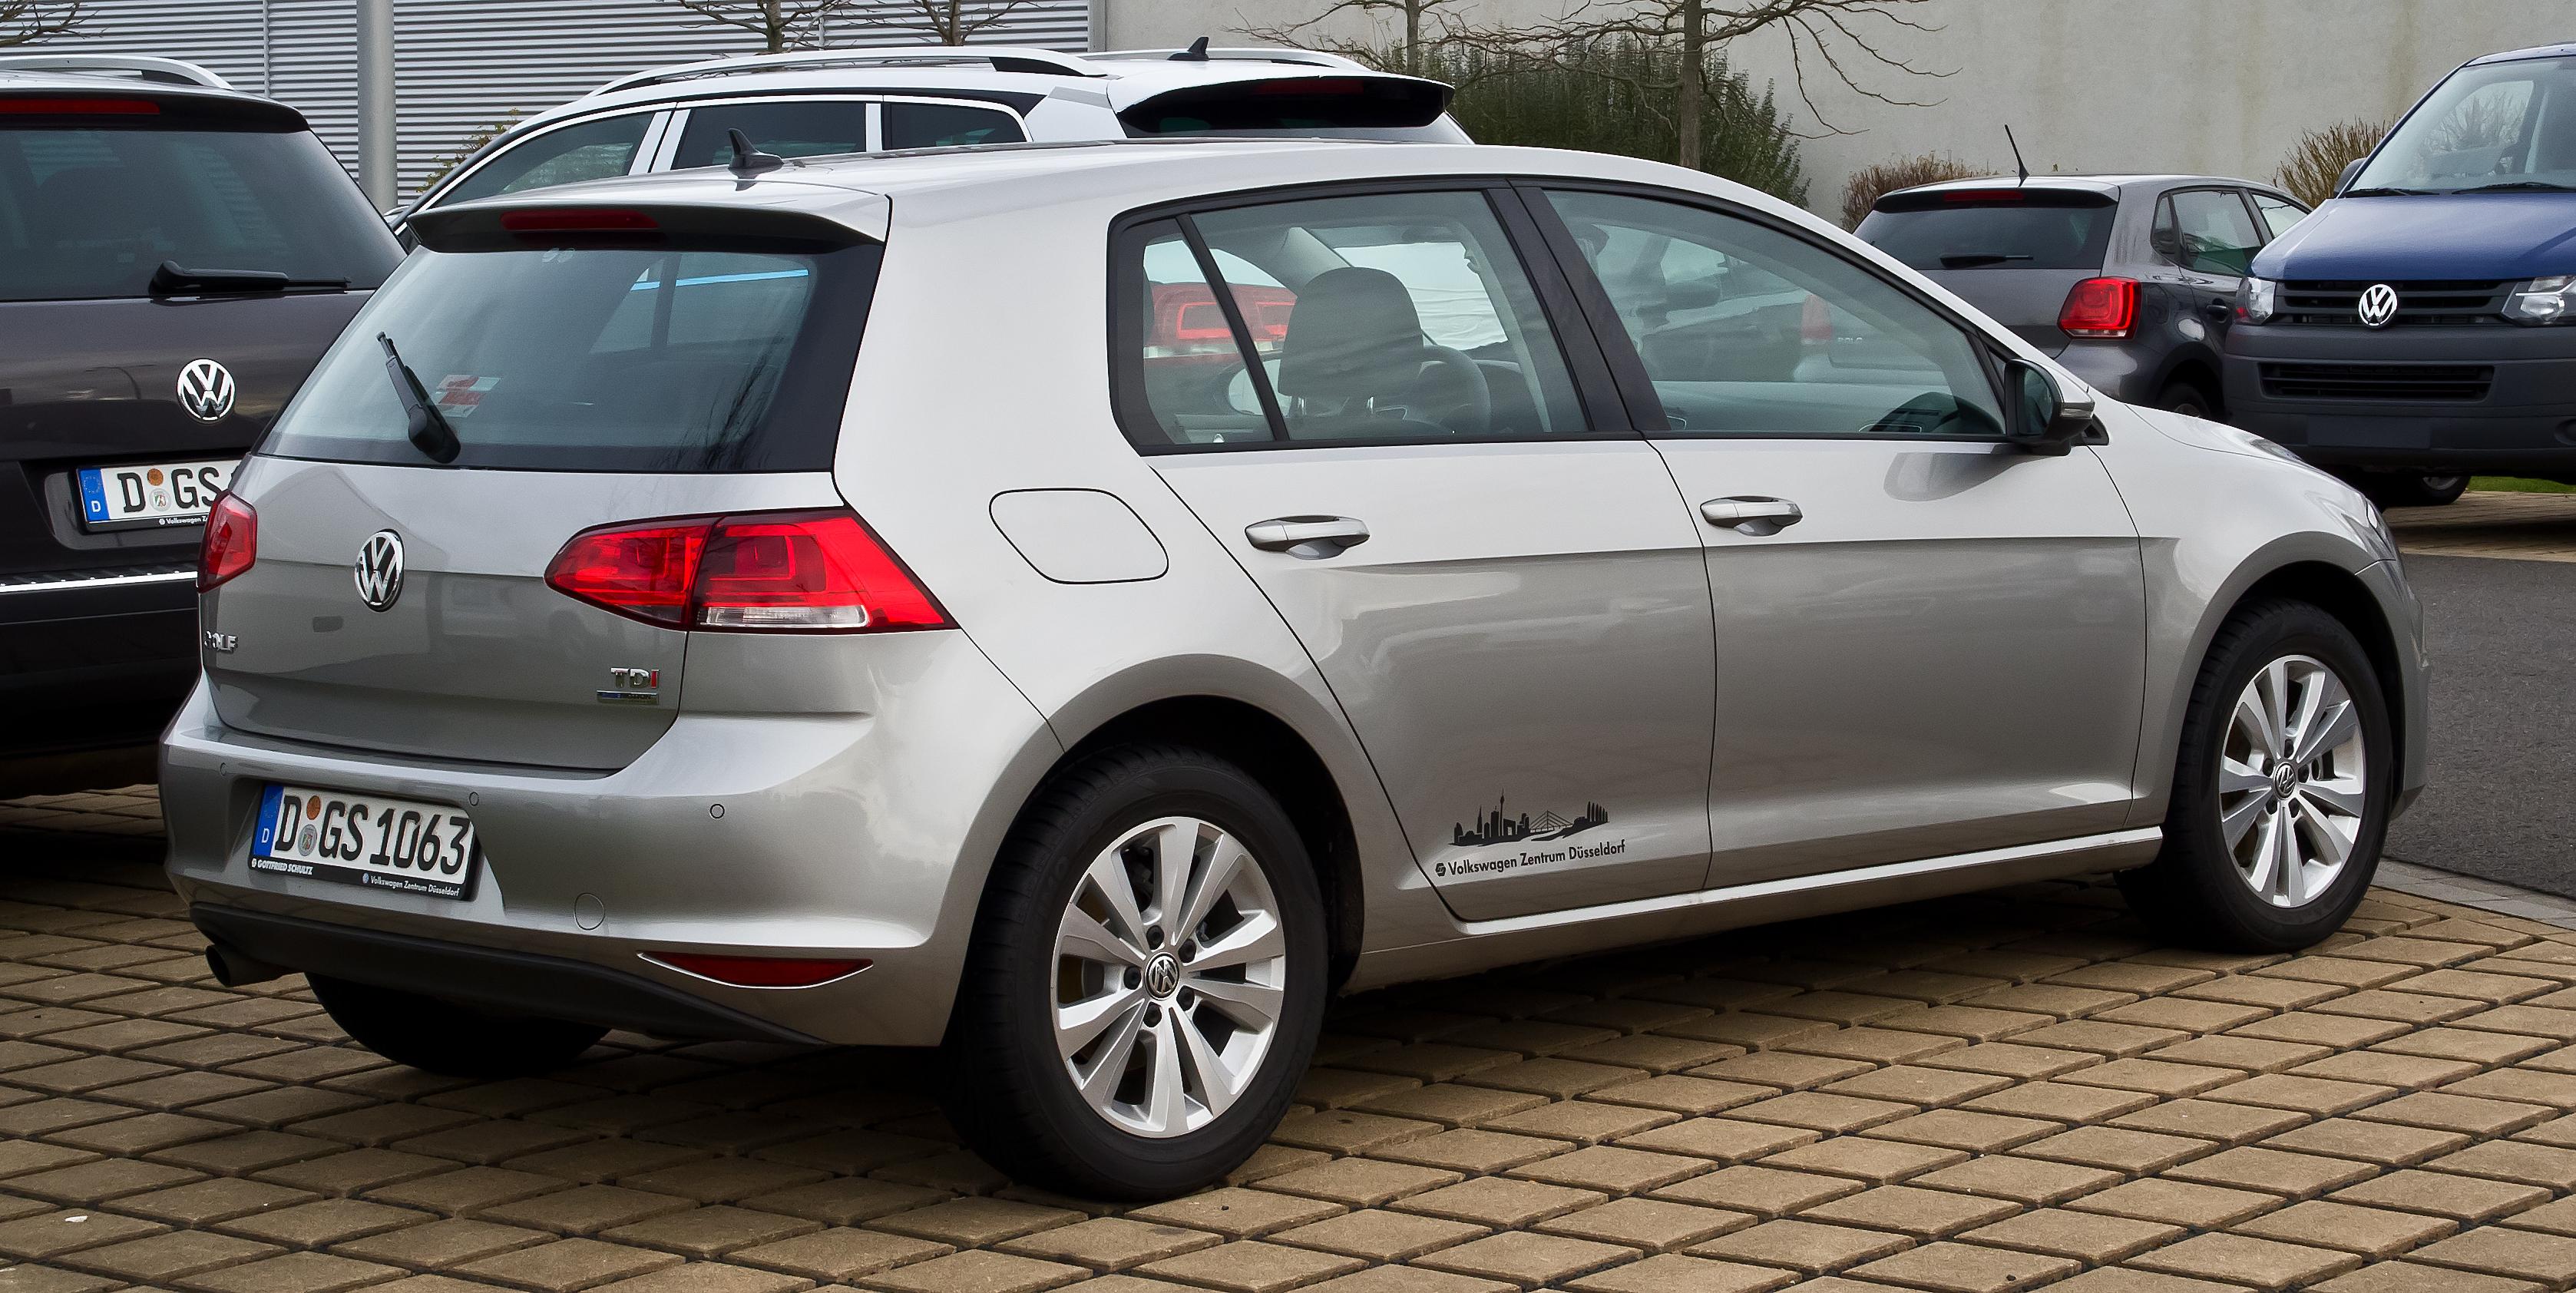 Description VW Golf 1.6 TDI BlueMotion Technology Comfortline (VII